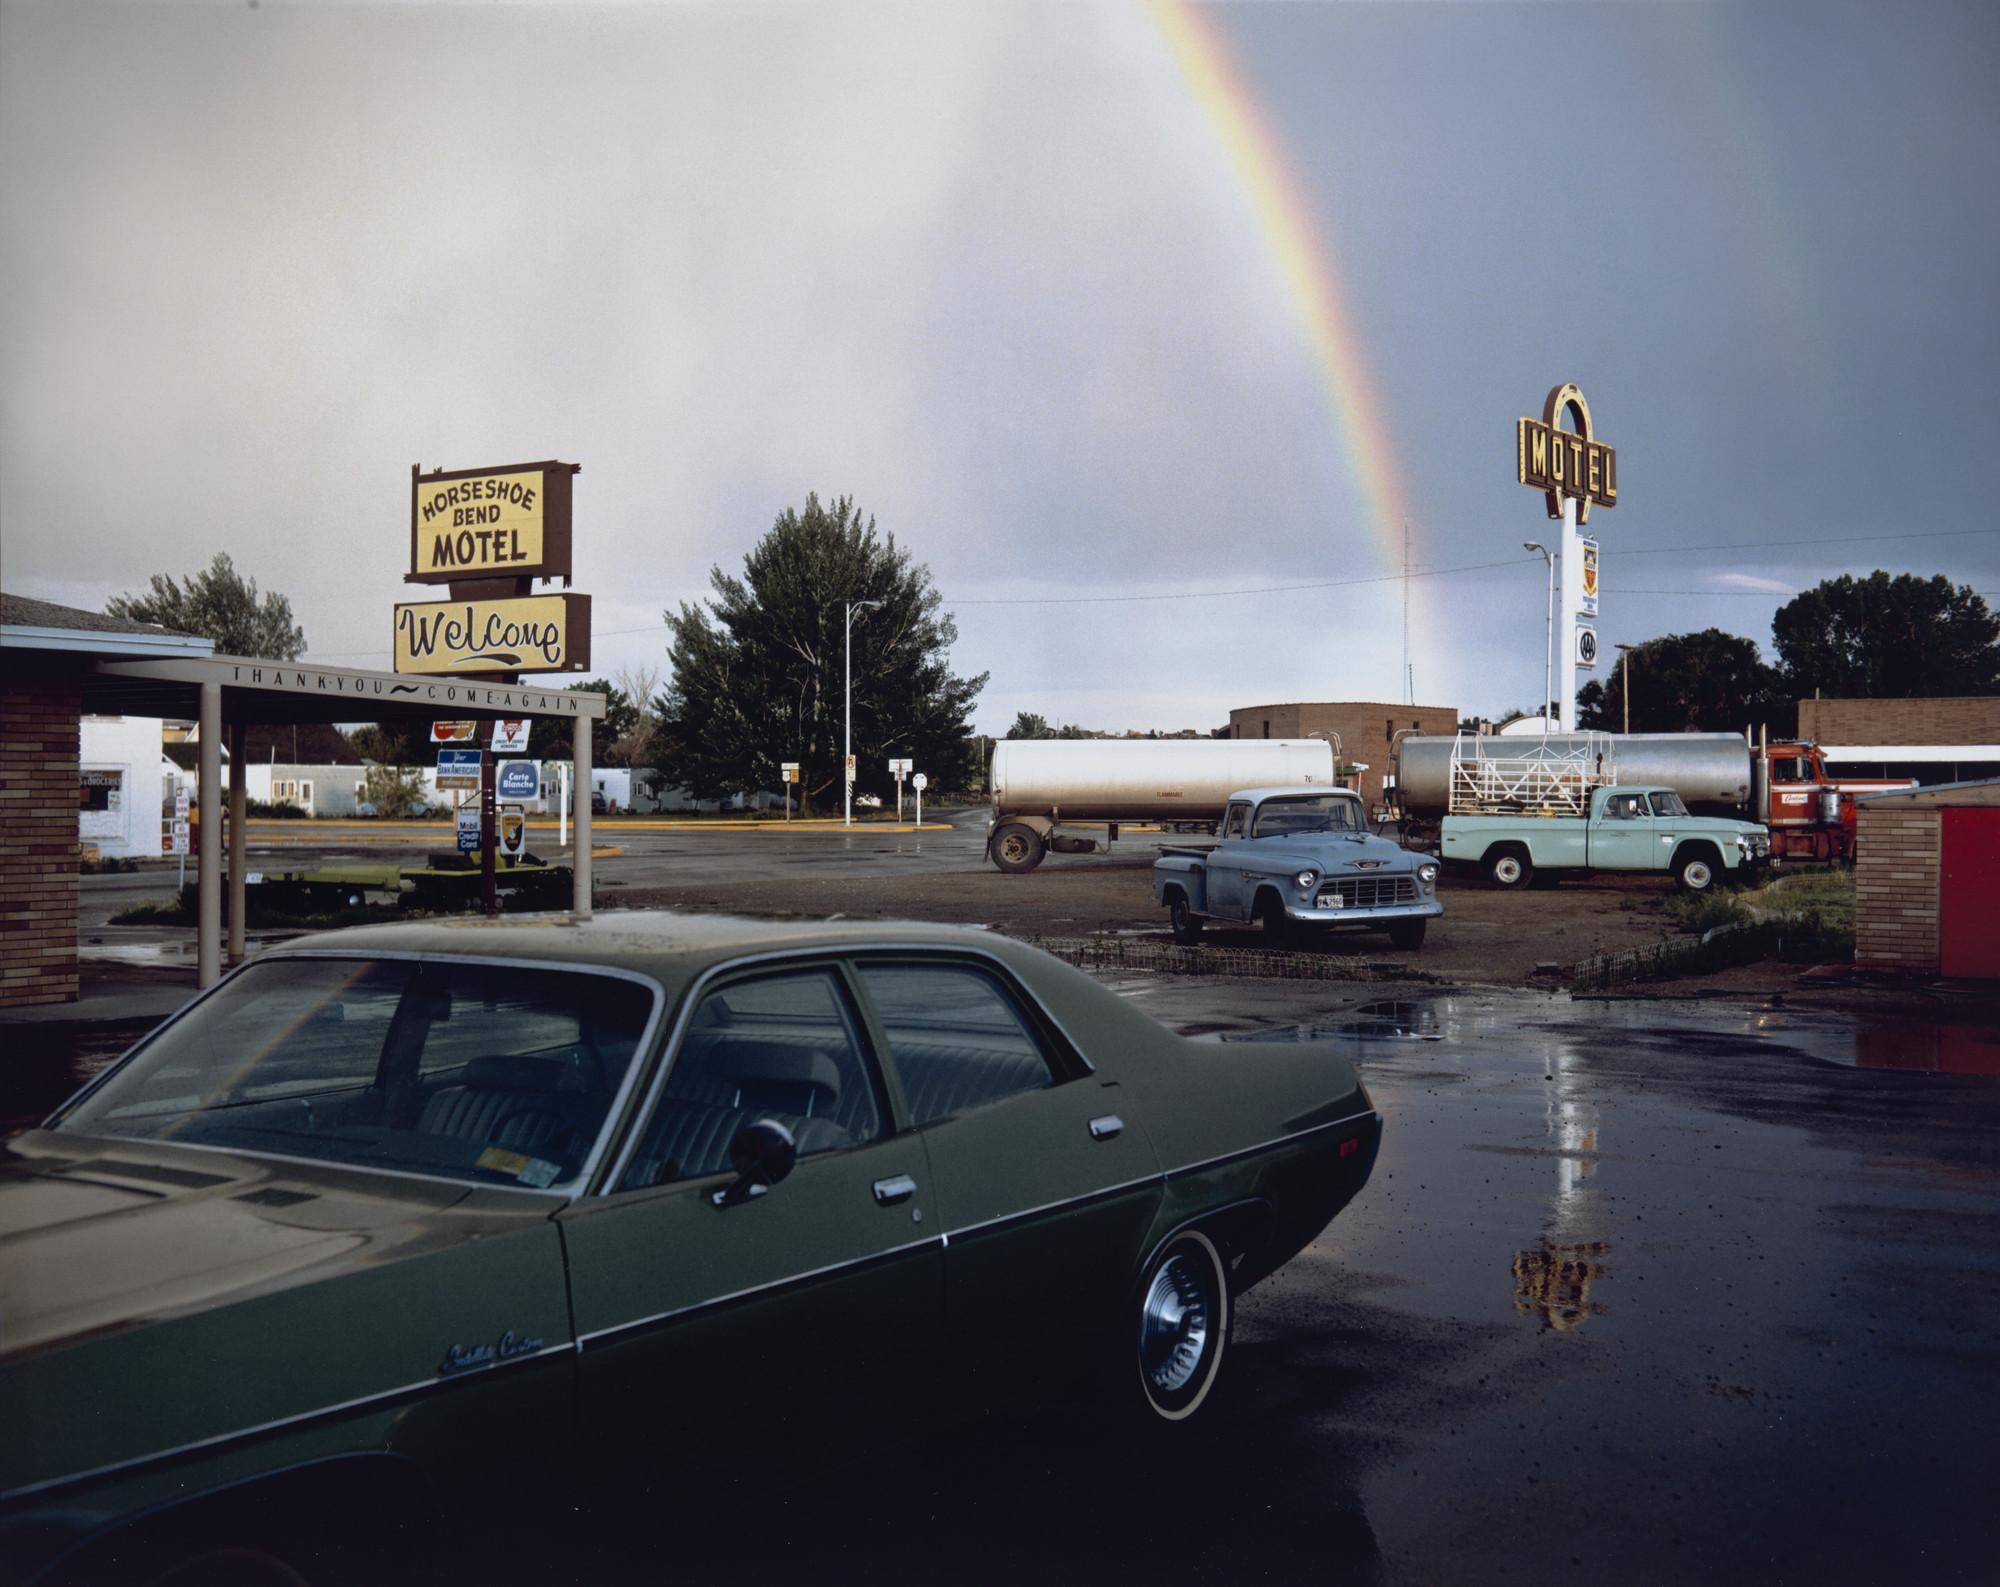 Stephen Shore Horseshoe Bend Motel Lovell Wyoming July